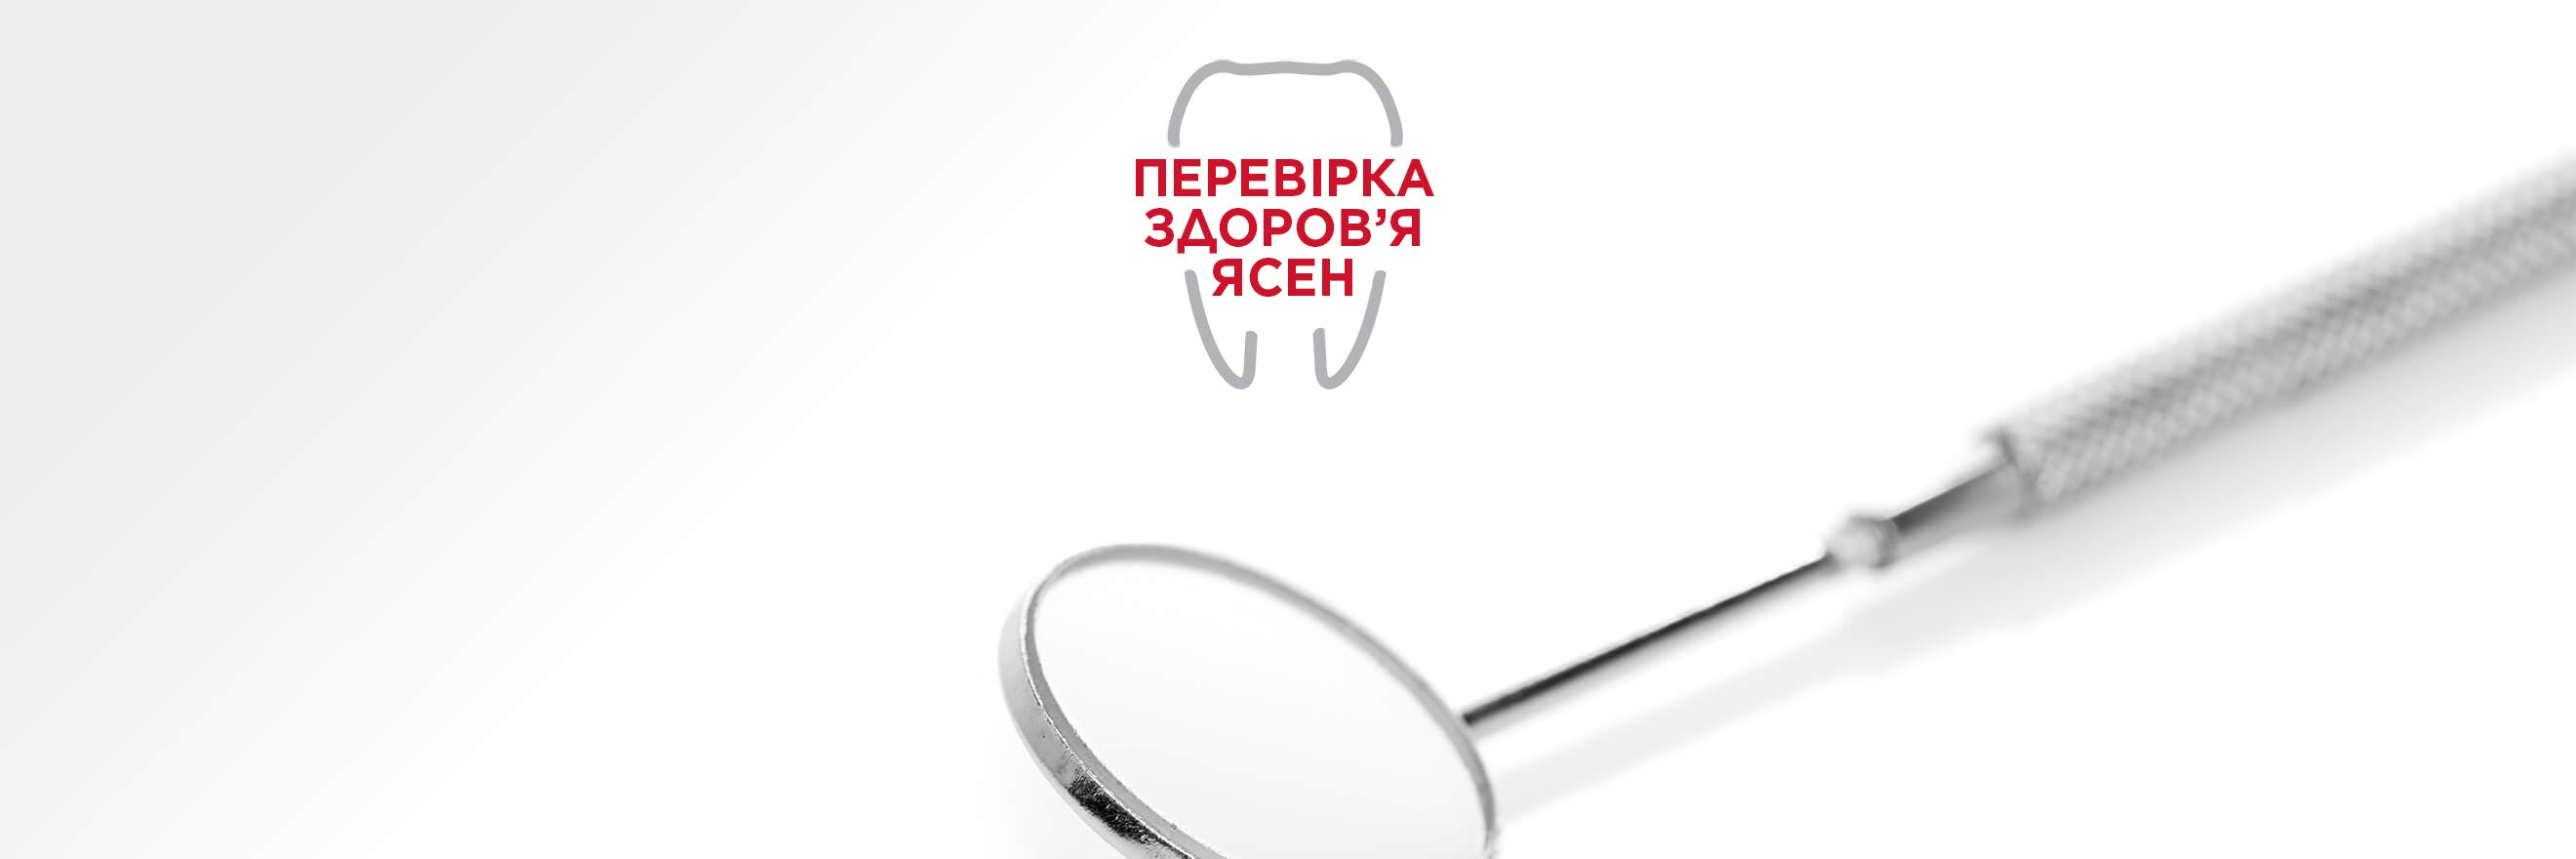 Dentist mirror tool